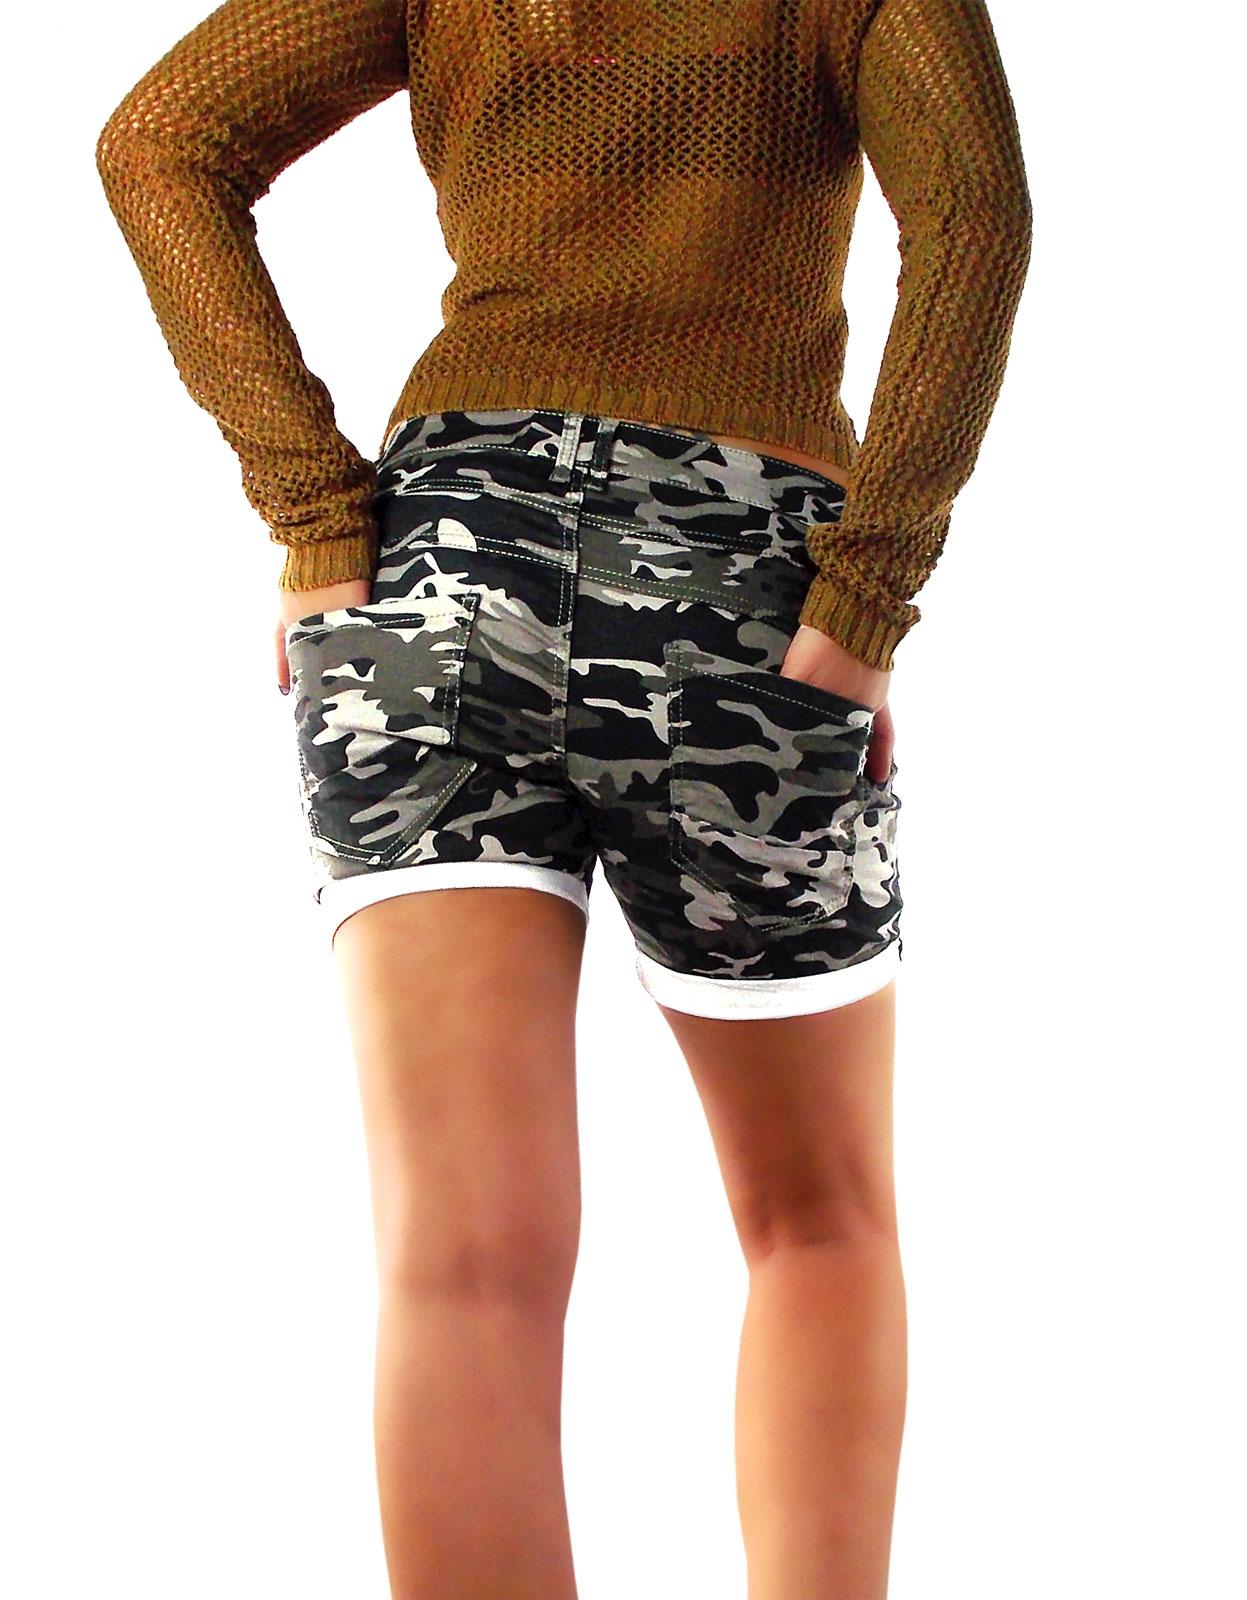 035d39809220d7 Damen Shorts kurze Hose Camouflage Military Tarn-Muster Army Bundeswehr  Style grün-grau Töne